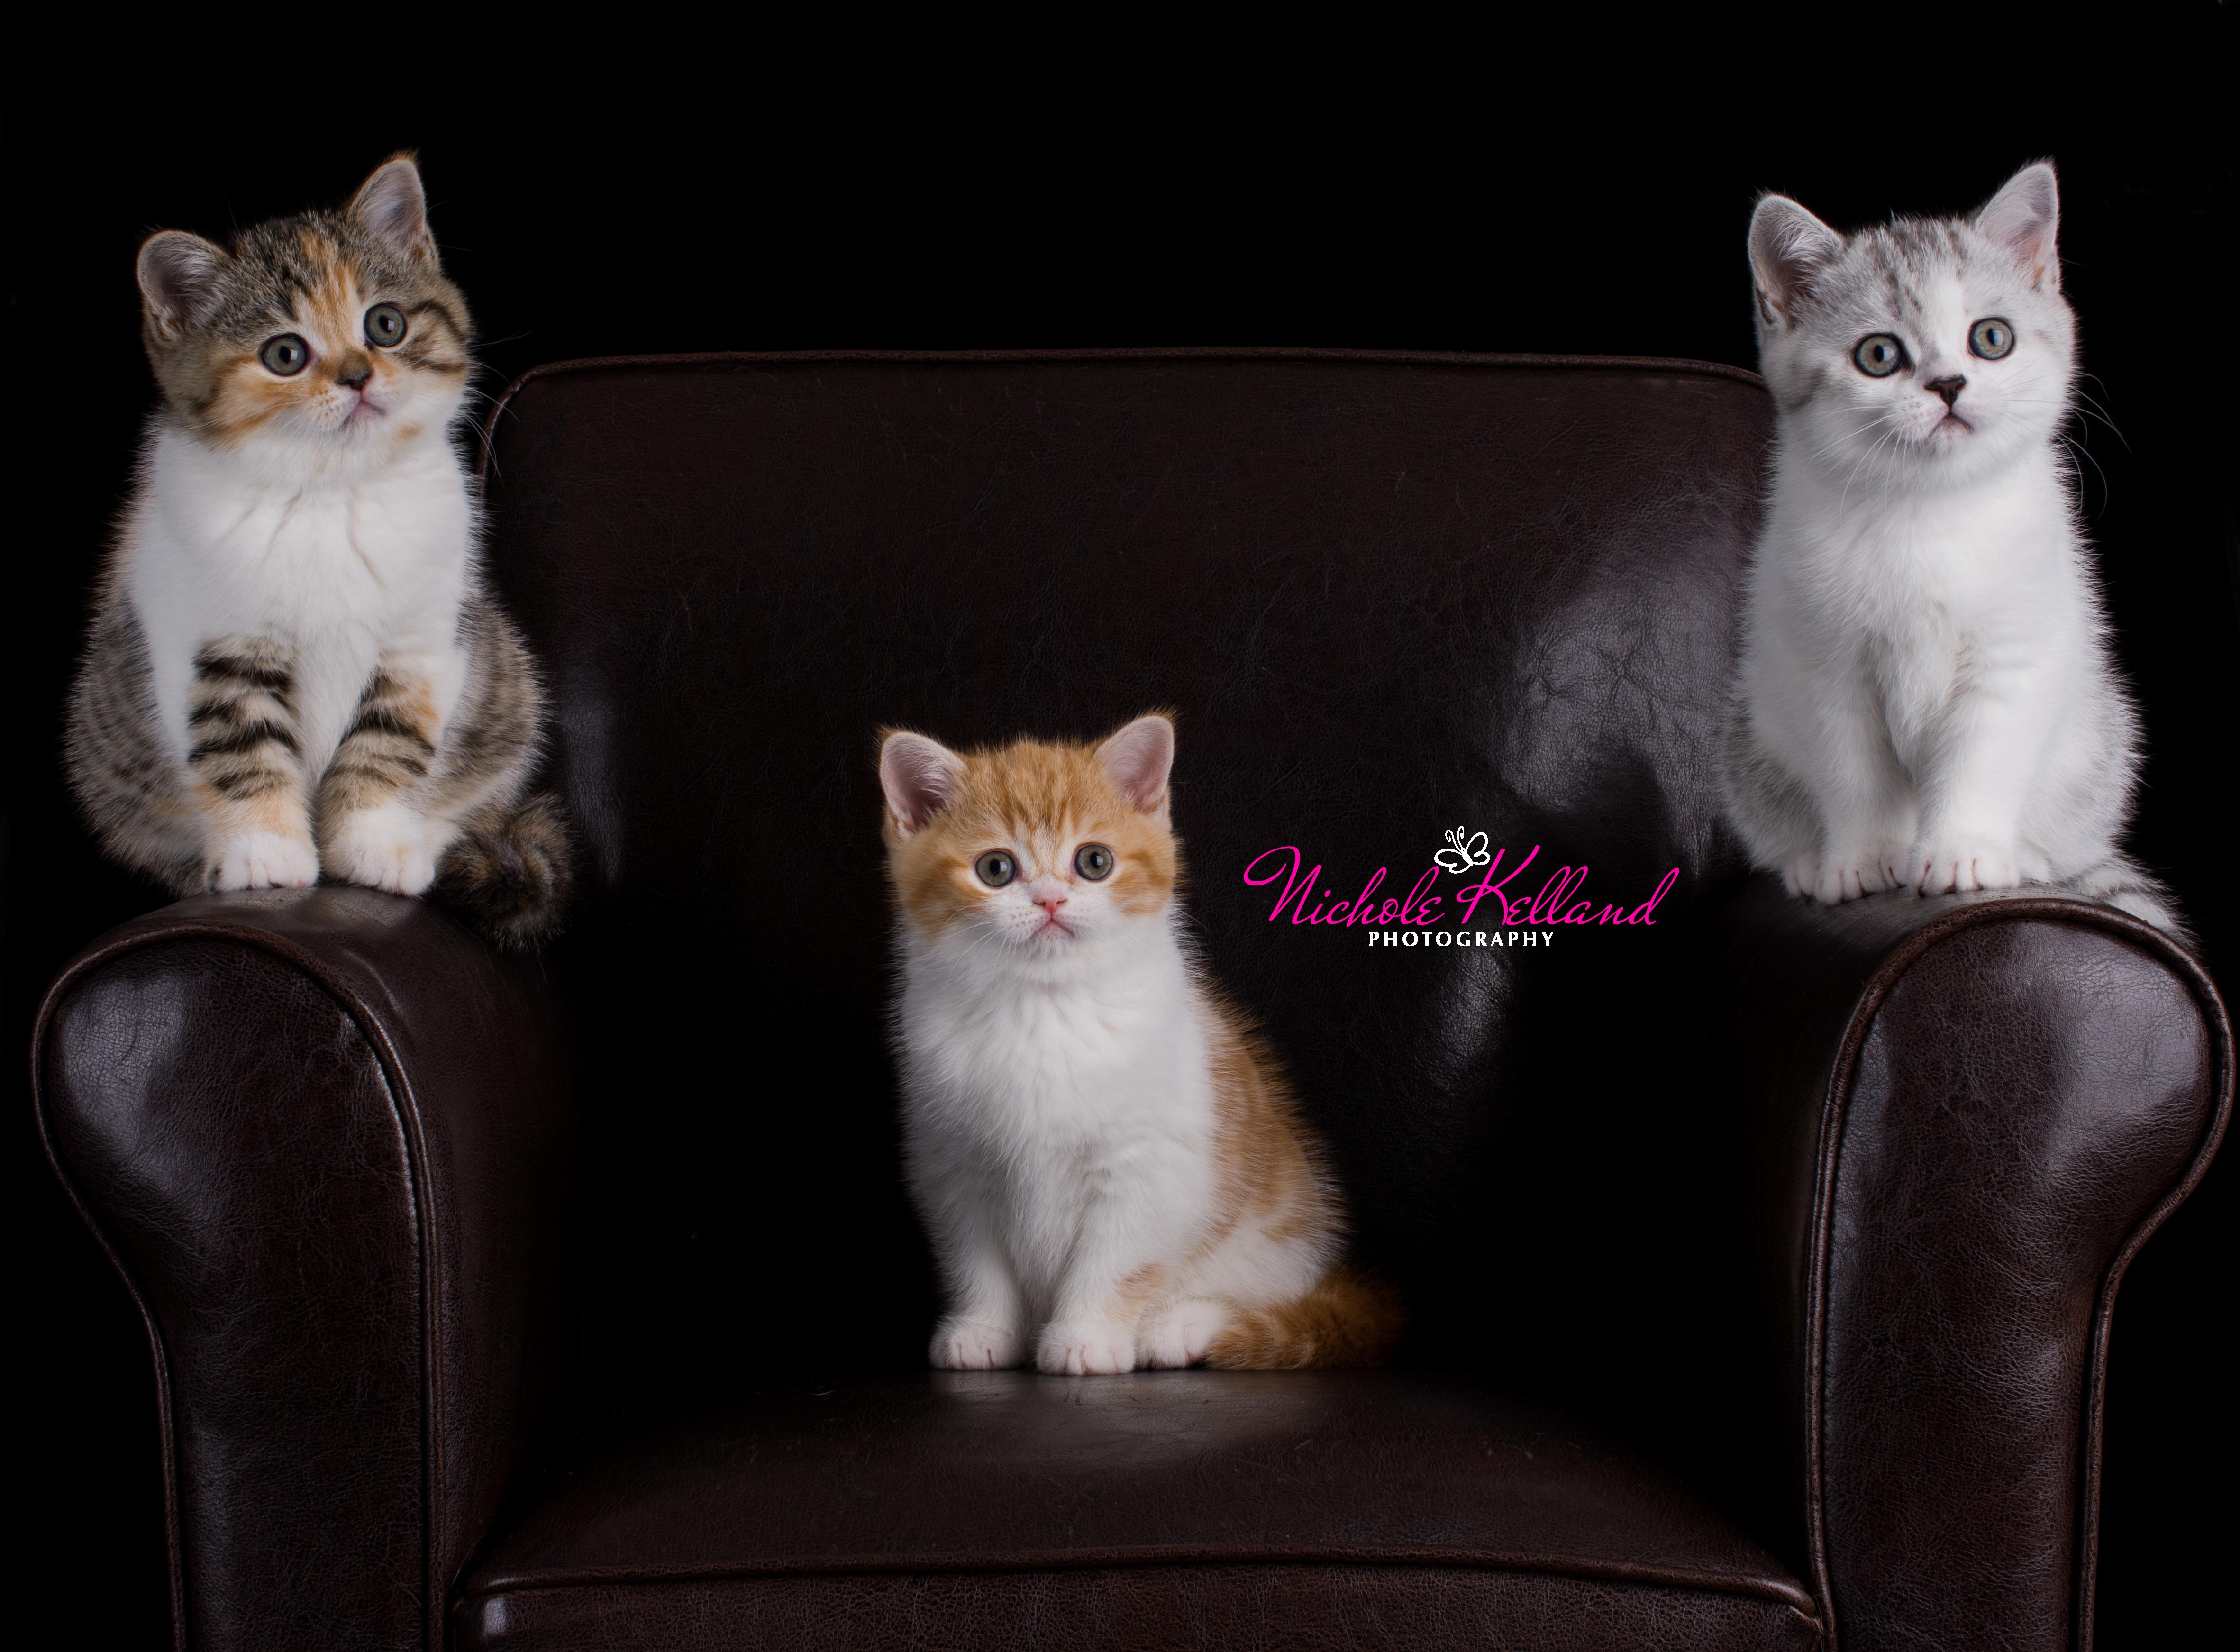 Chair of cuteness